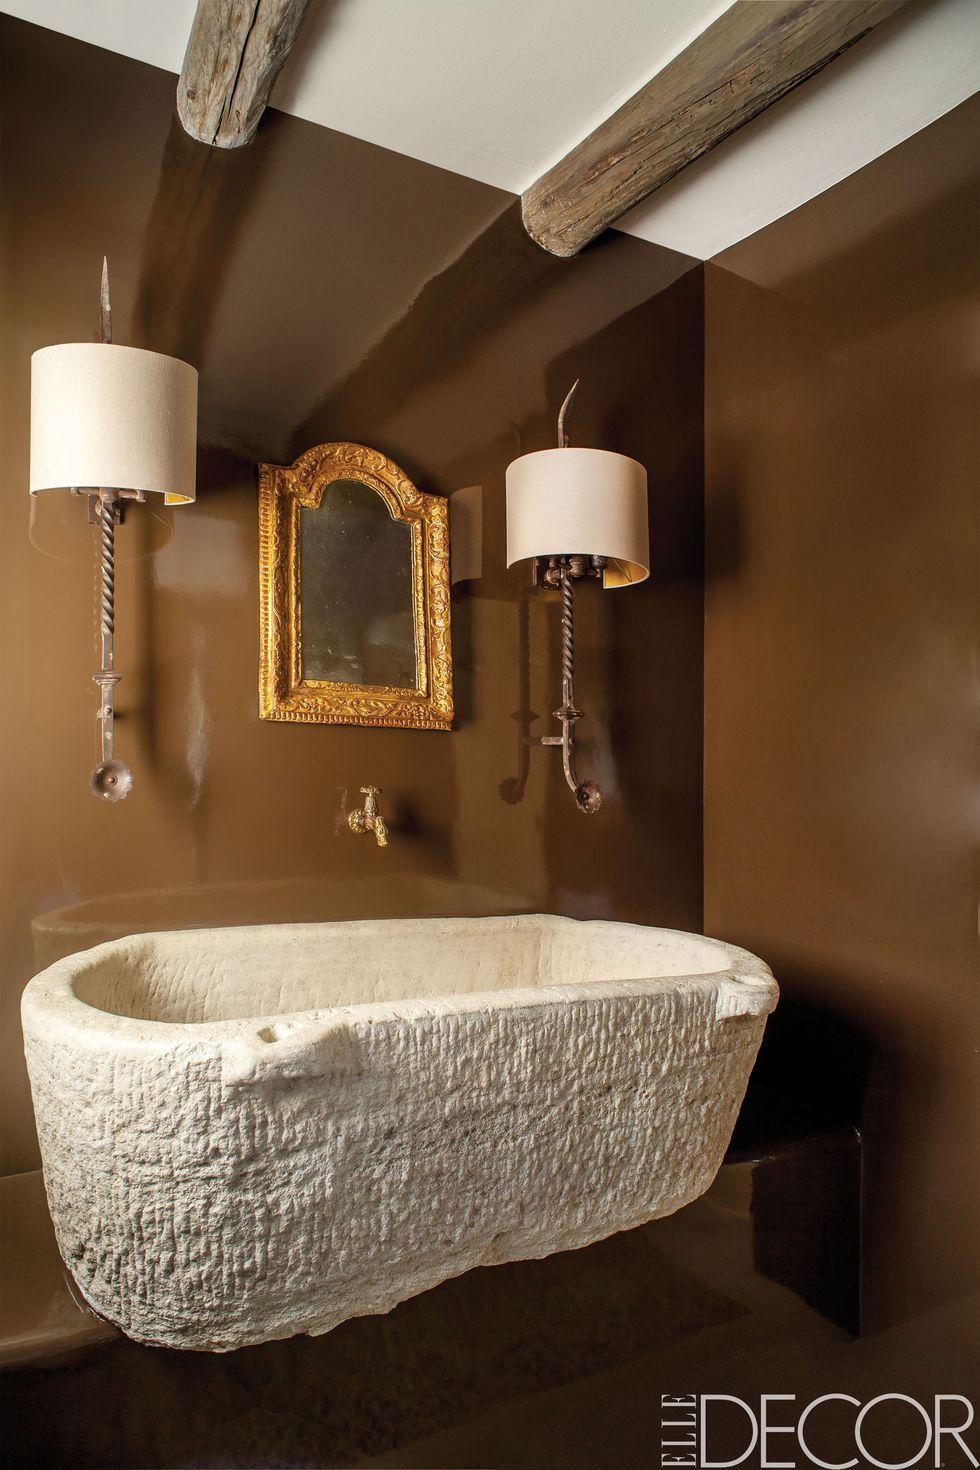 Bathroom Decor Accents